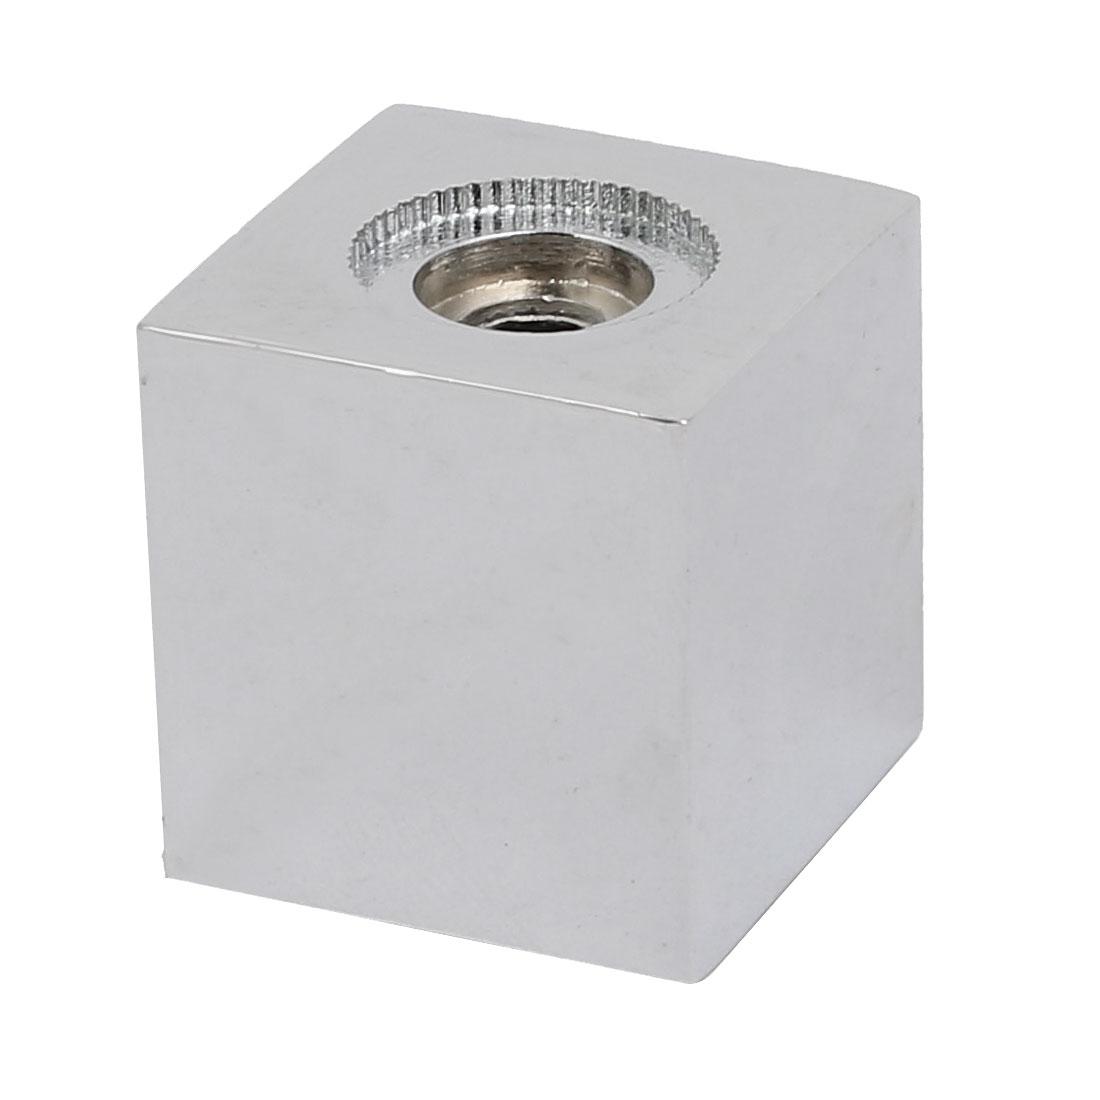 Faucet Fitting Zinc Alloy Universal Square Handle Kits Silver Tone